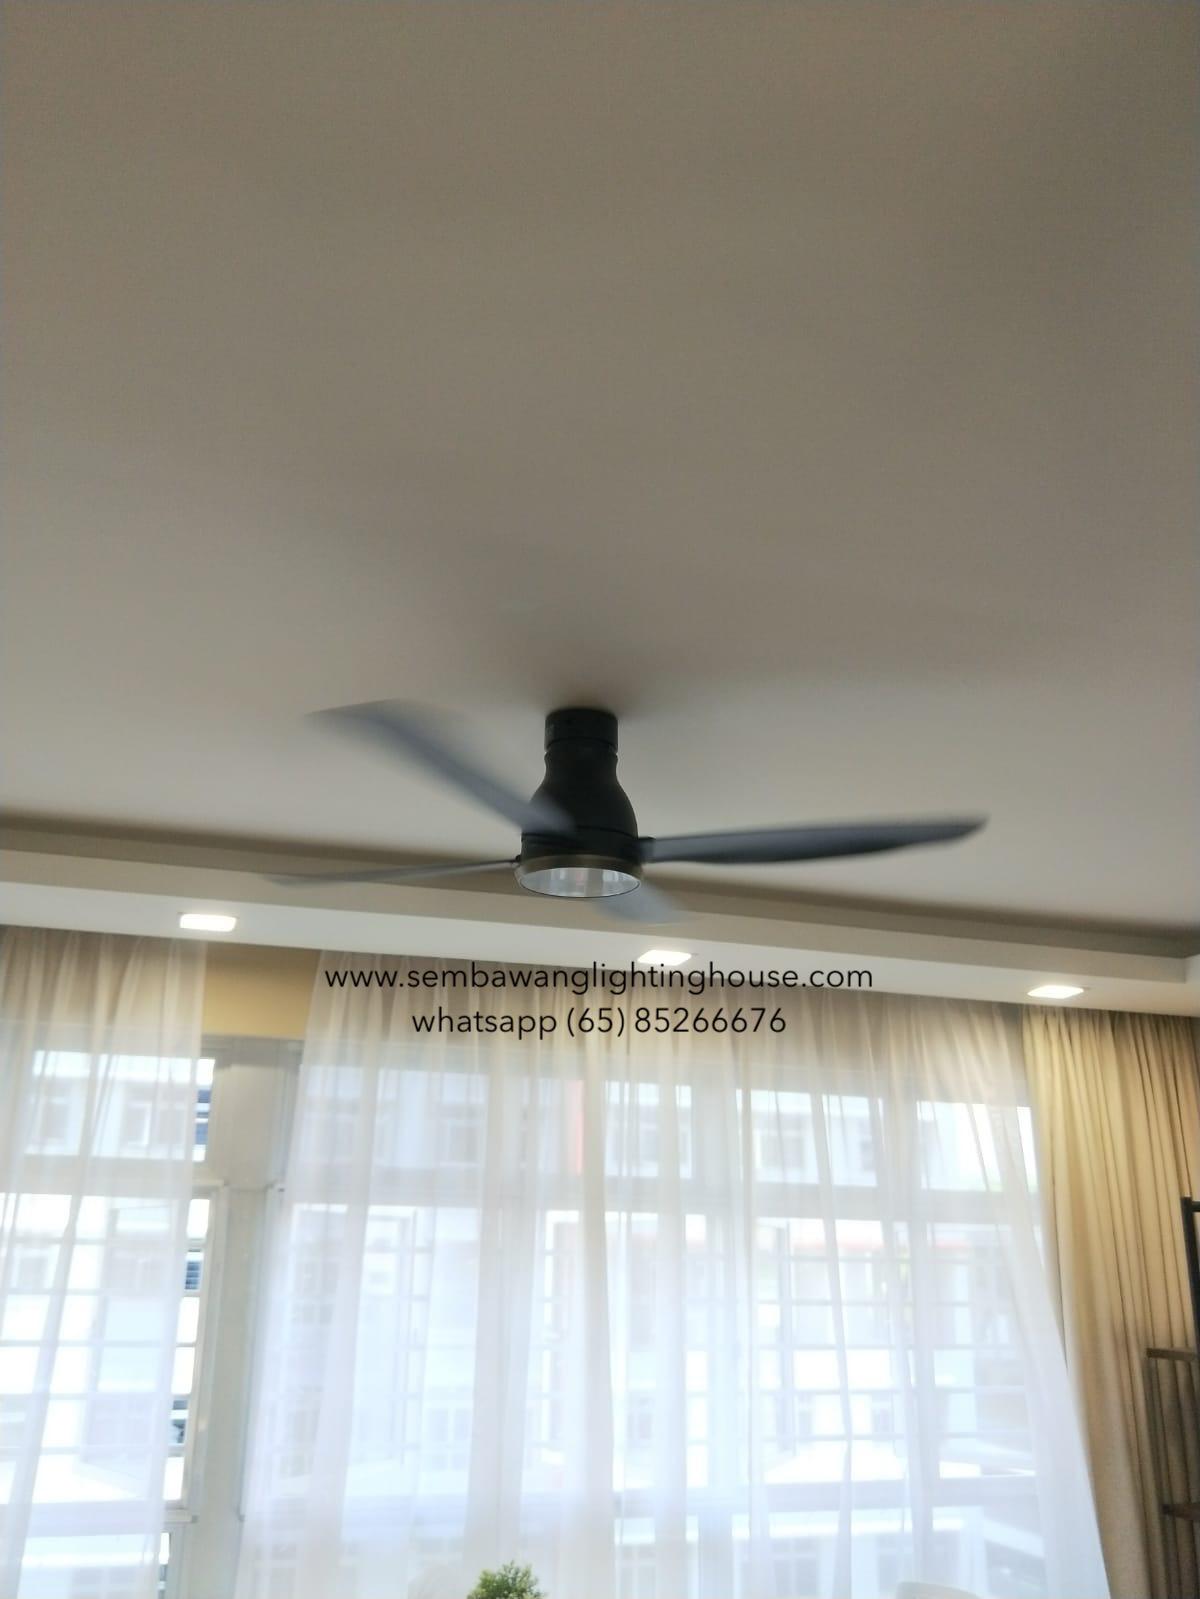 kdk-w56wv-black-ceiling-fan-sembawang-lighting-house-sample-10.jpg